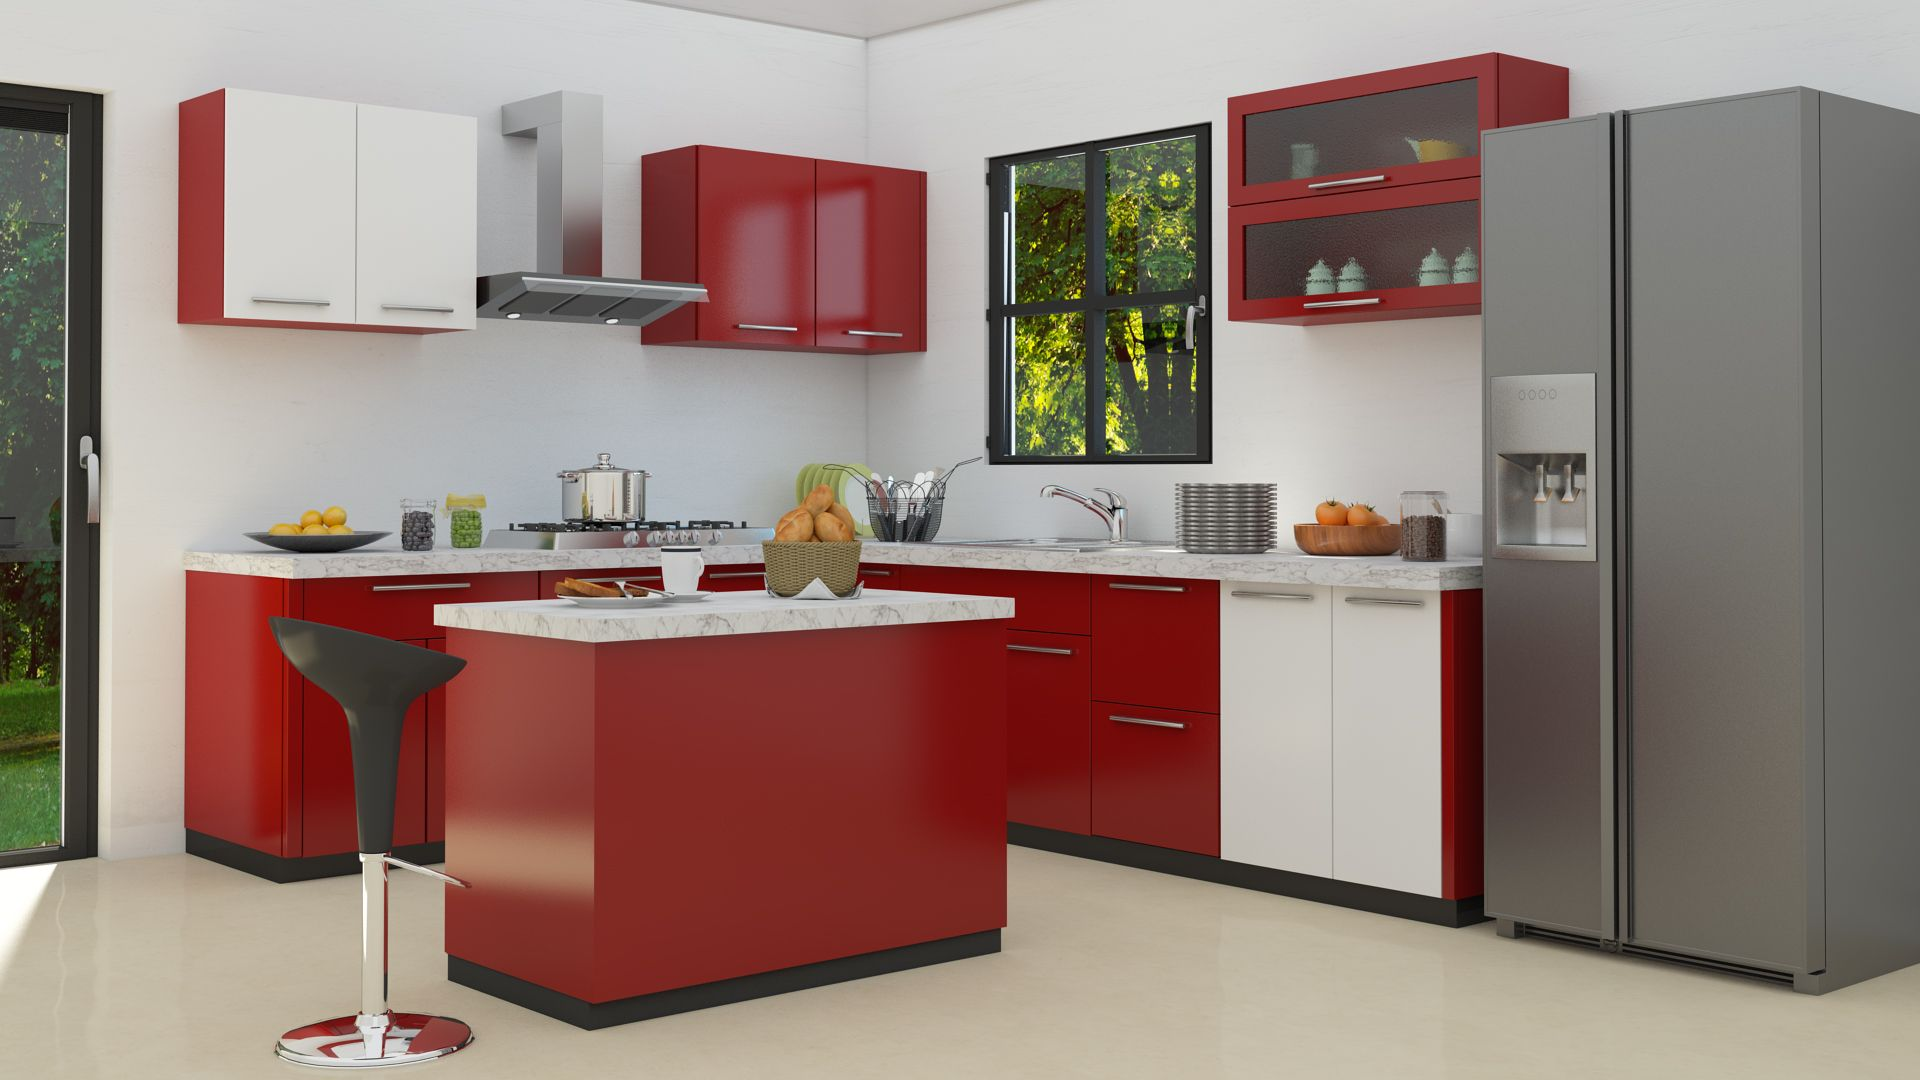 L Shaped Modular Kitchen Designs Red Kitchen Cabinets Beautiful